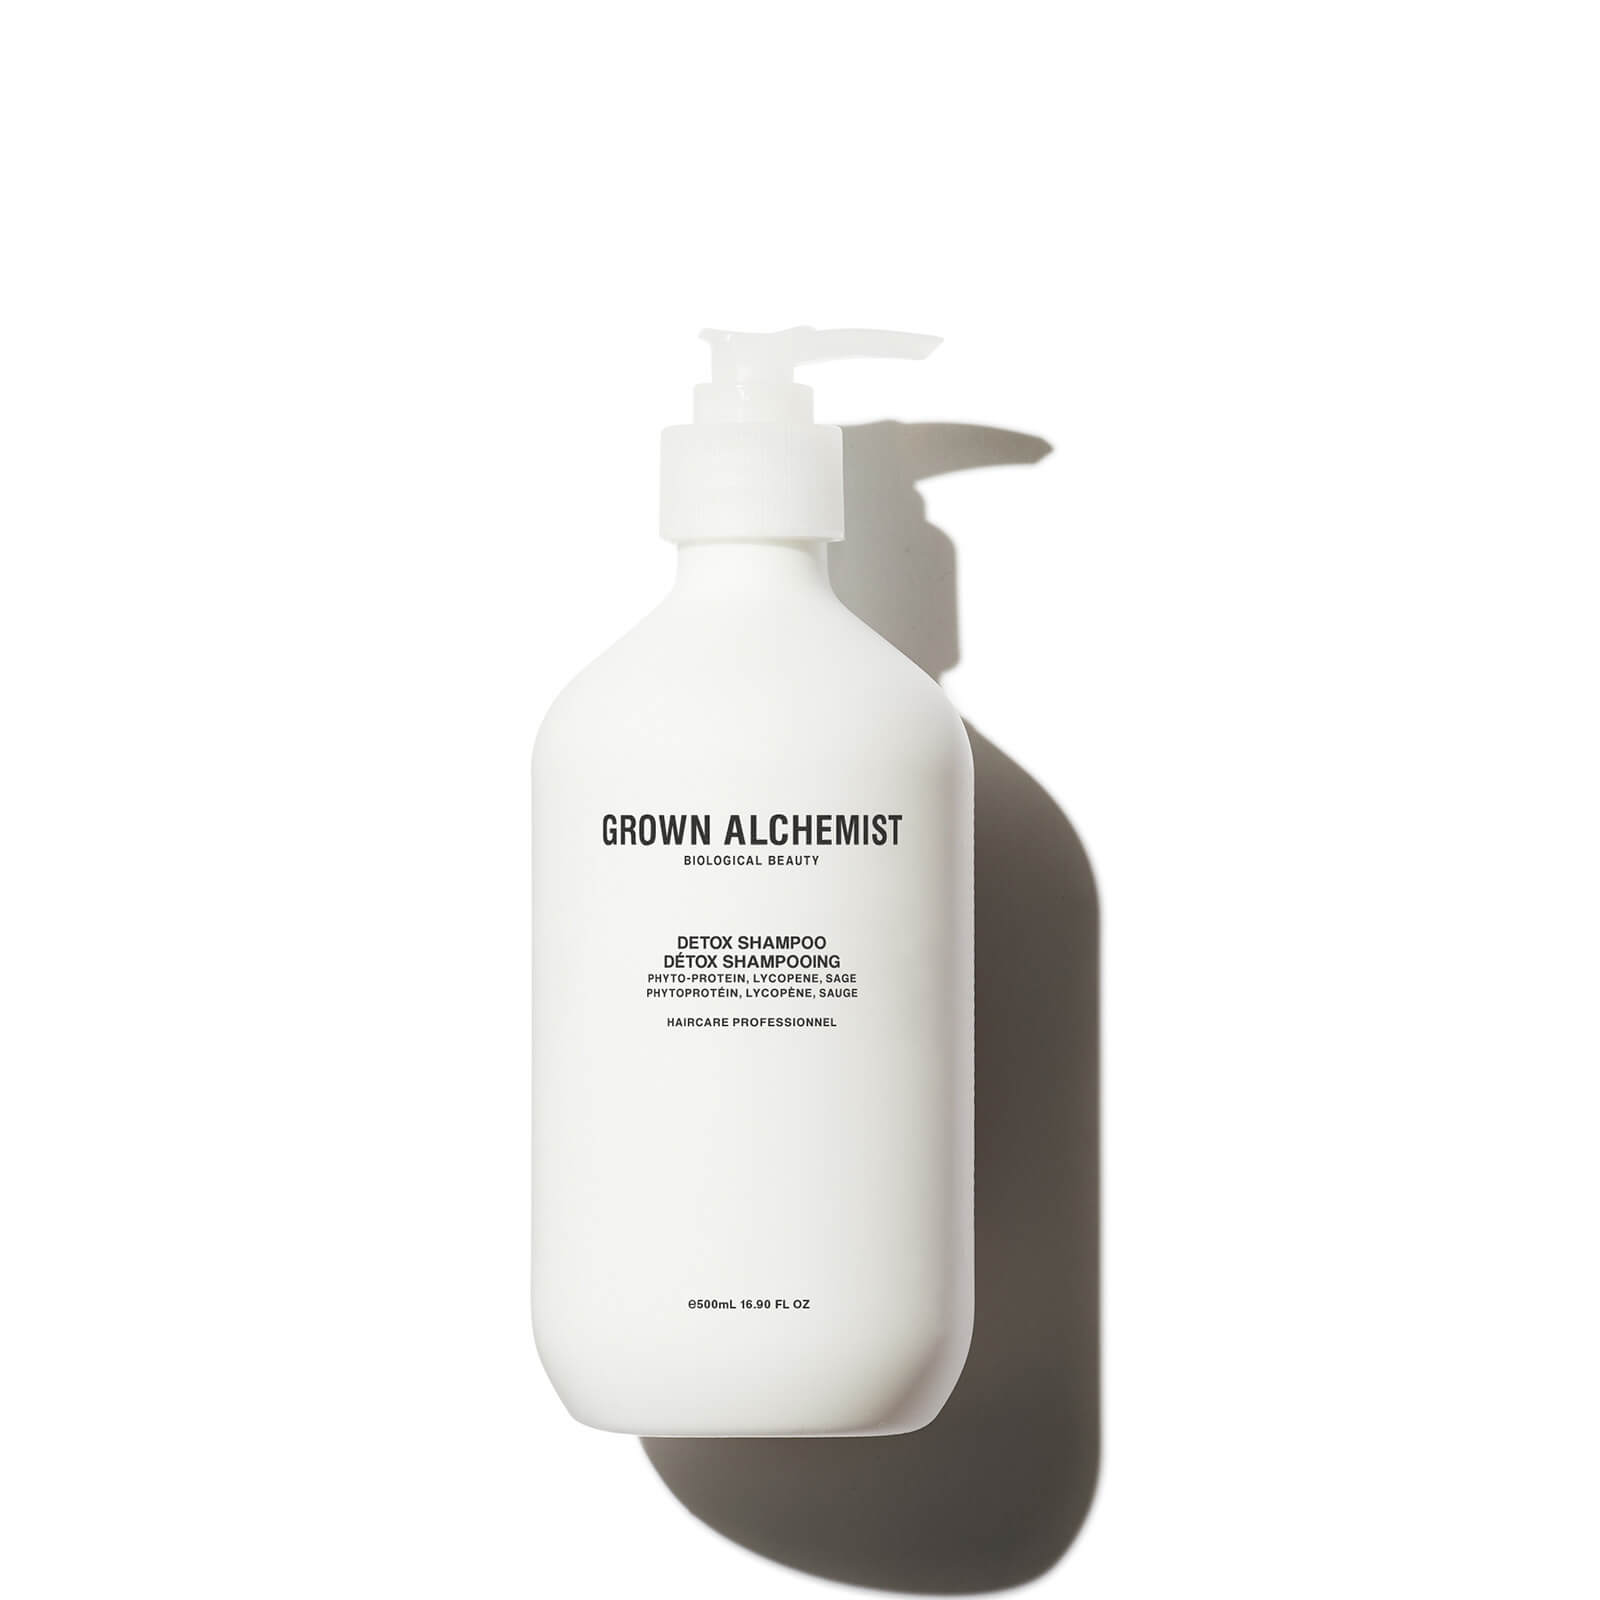 Grown Alchemist Detox Shampoo 500ml